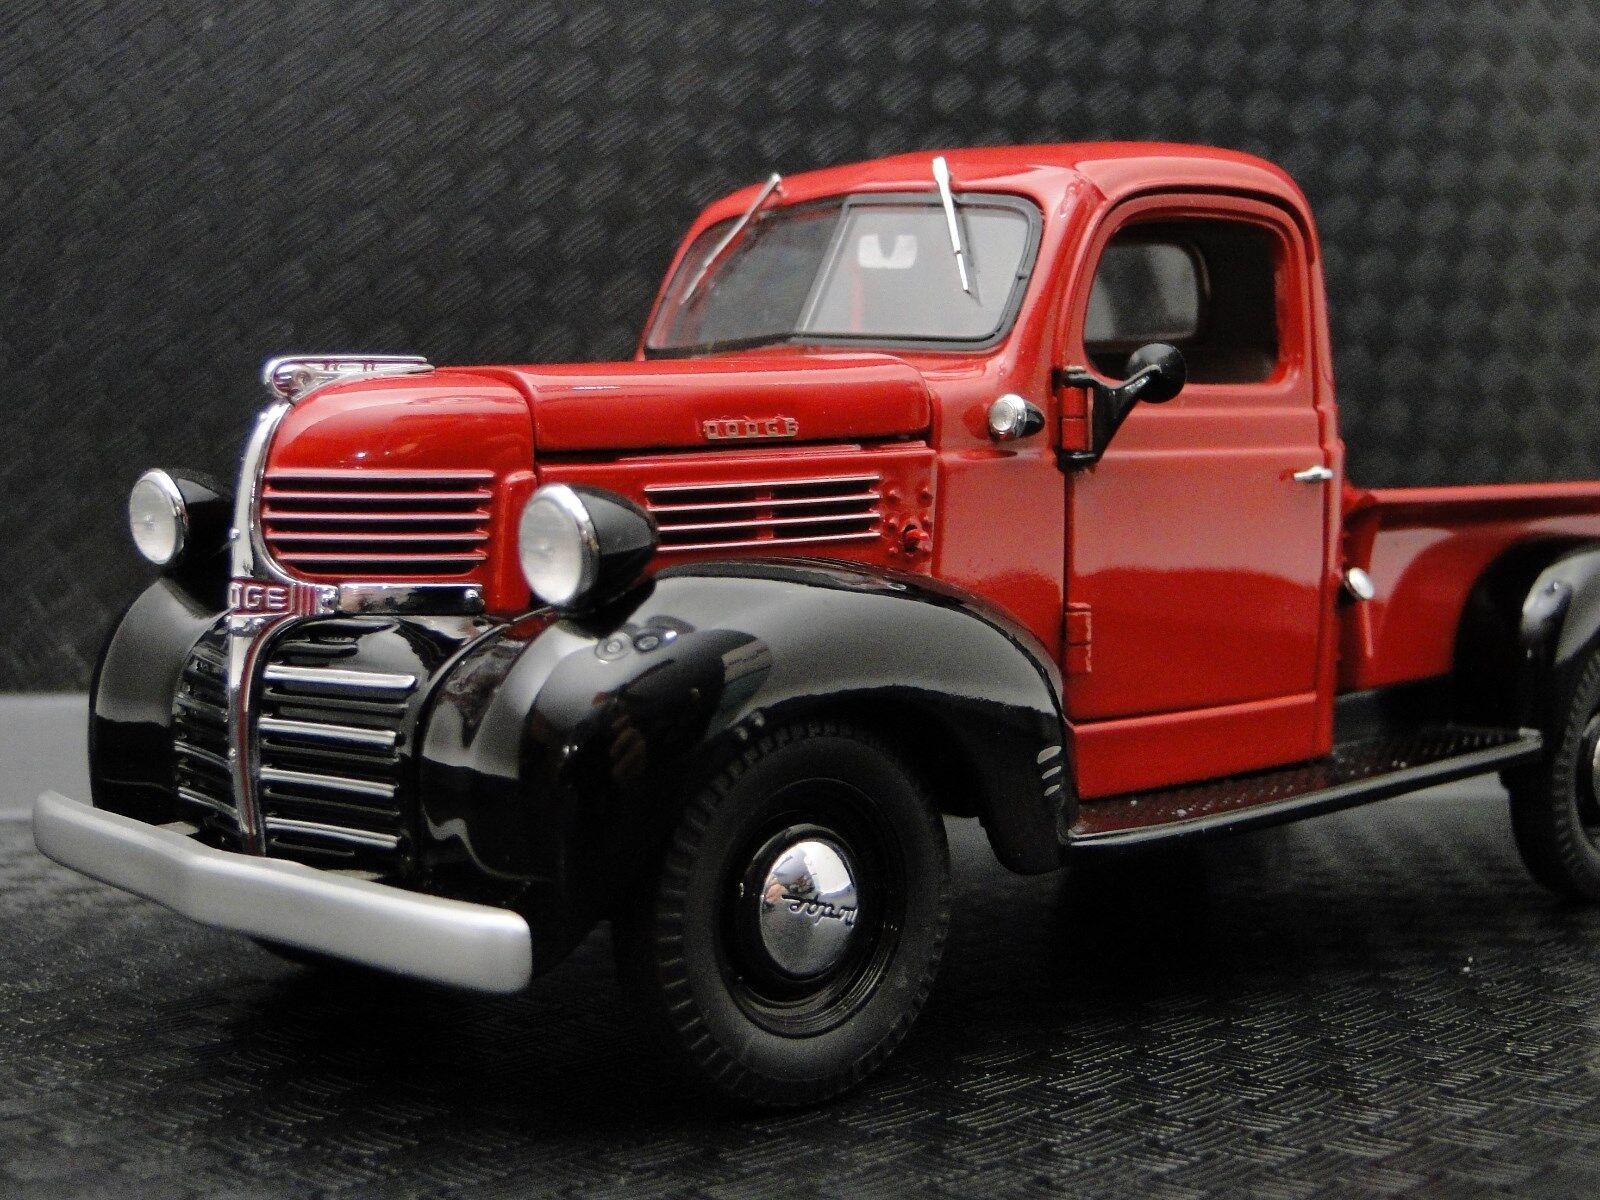 Dodge 1 camioneta 1940s Deporte construido 12 Vintage Modelo 18 carrusel rosso 24 coche